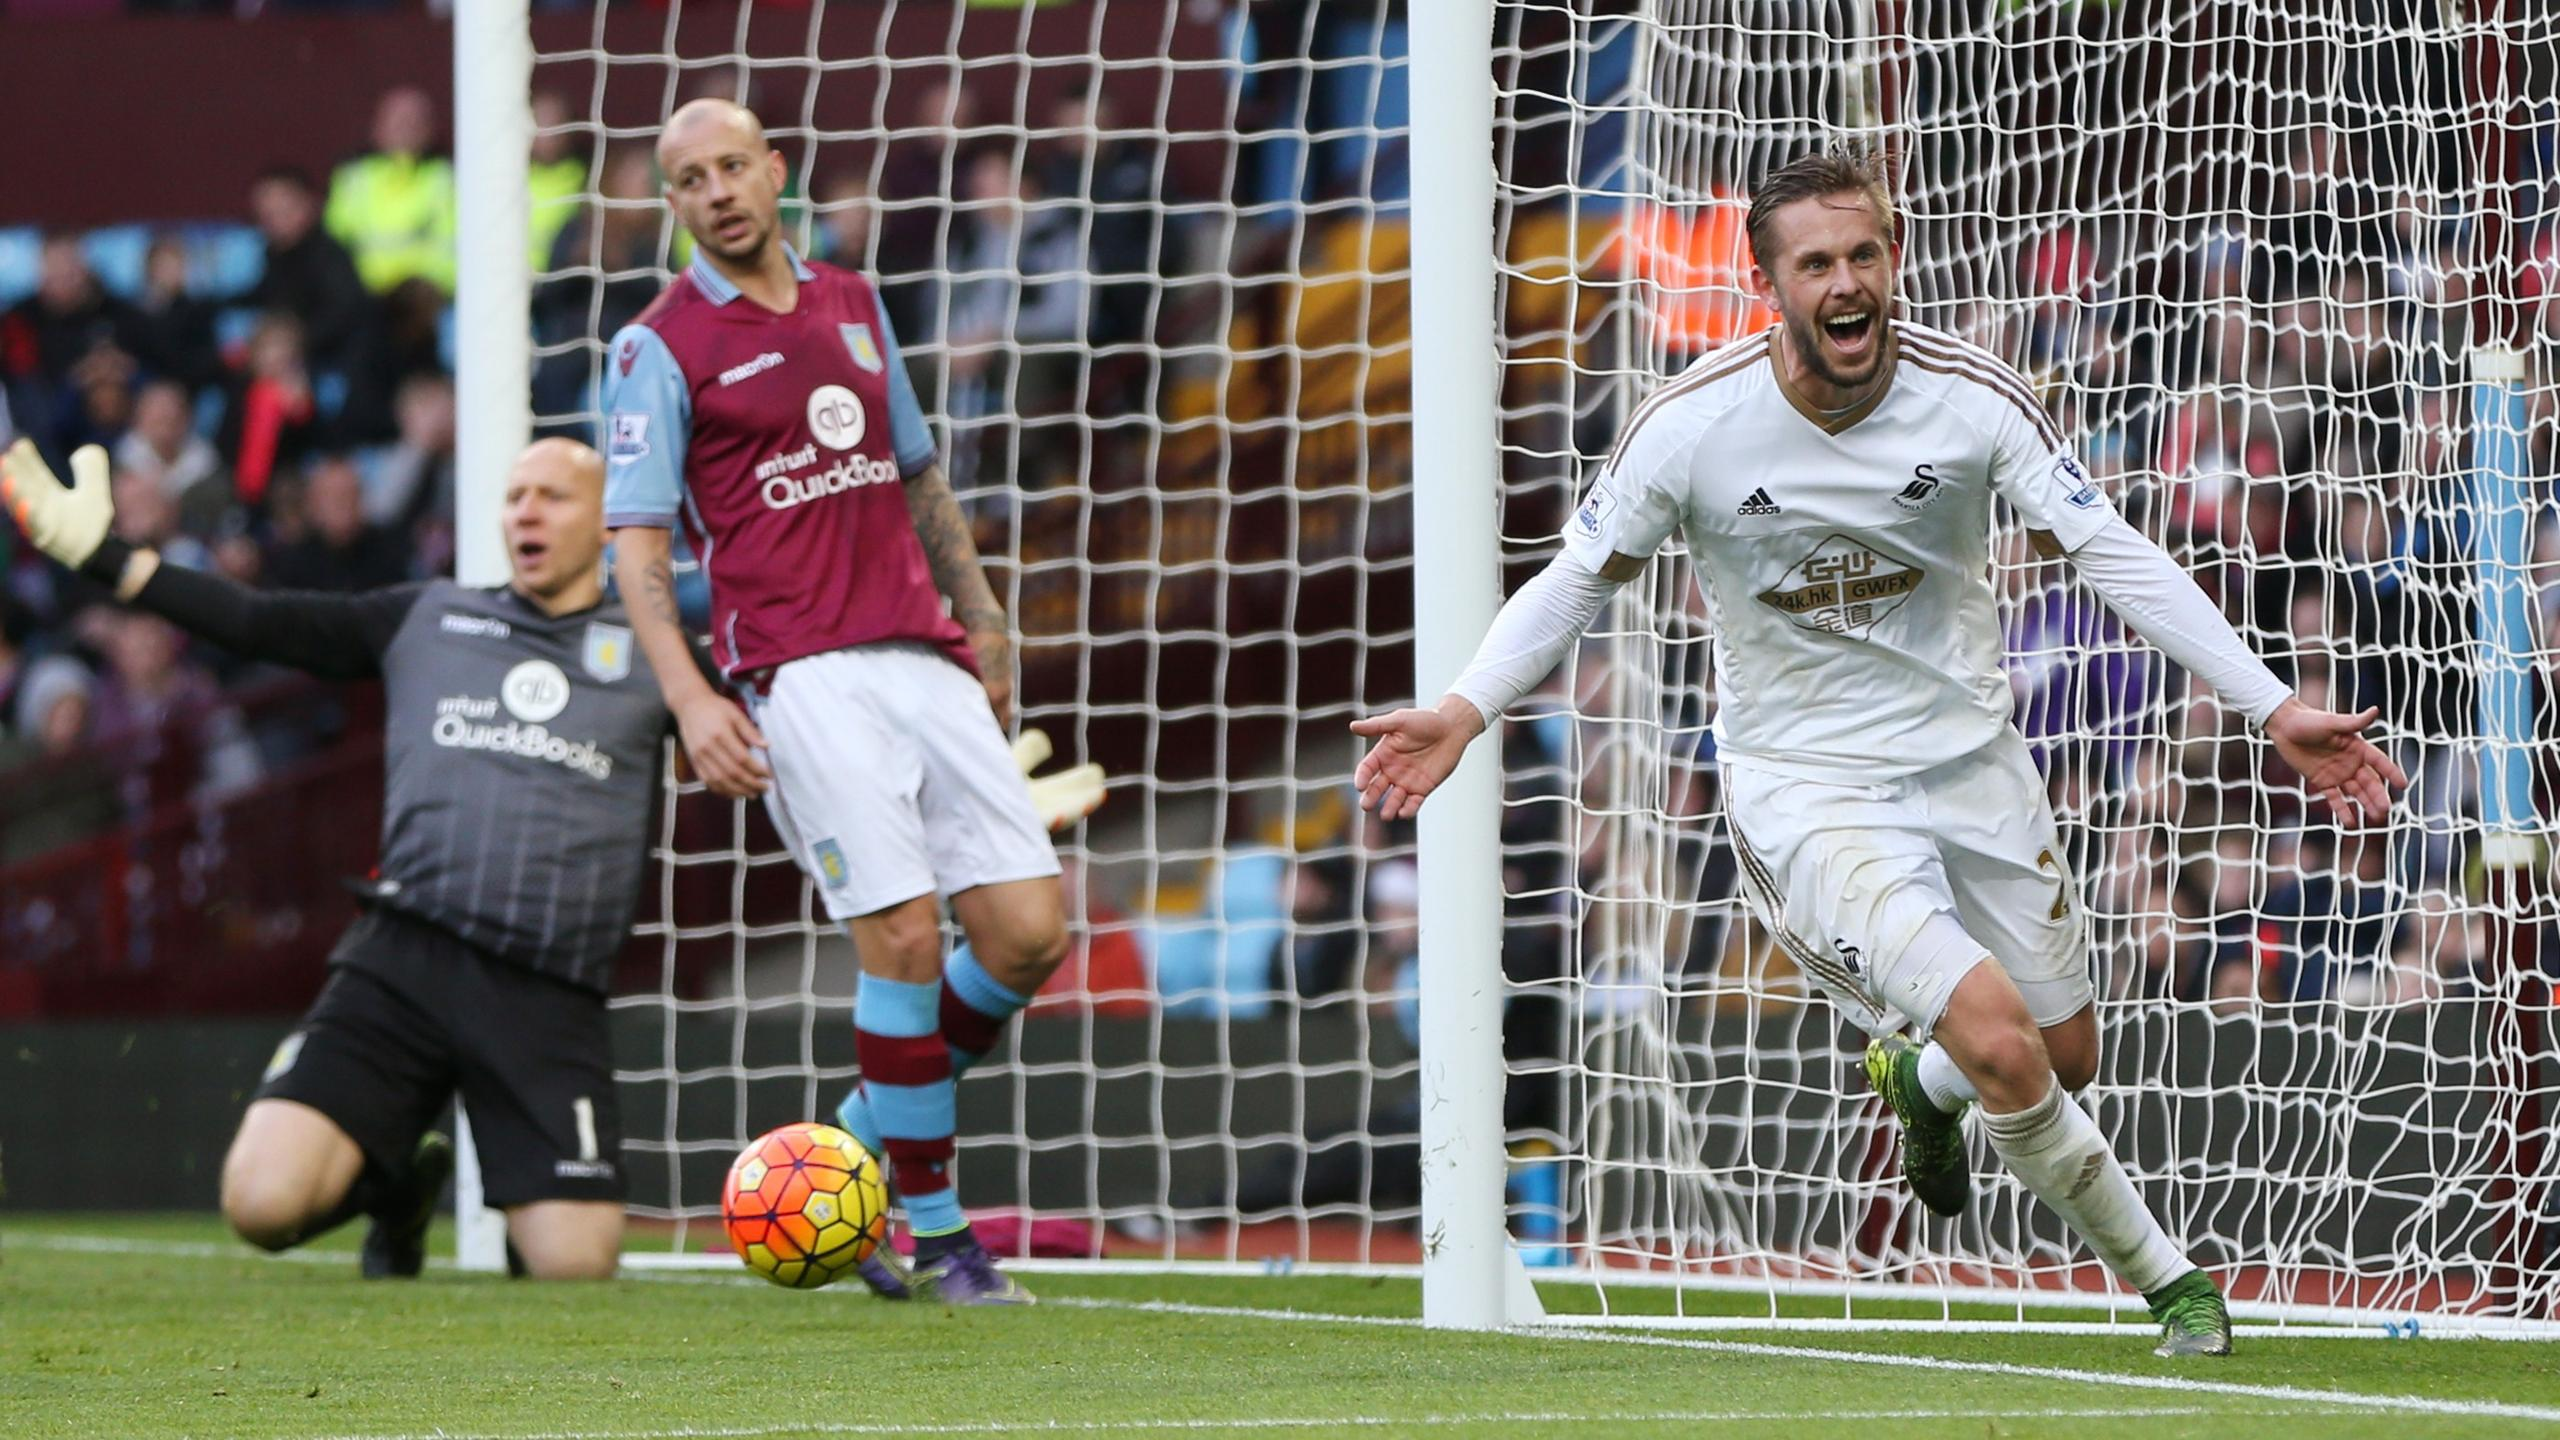 Gylfi Sigurdsson celebrates scoring for Swansea against Aston Villa